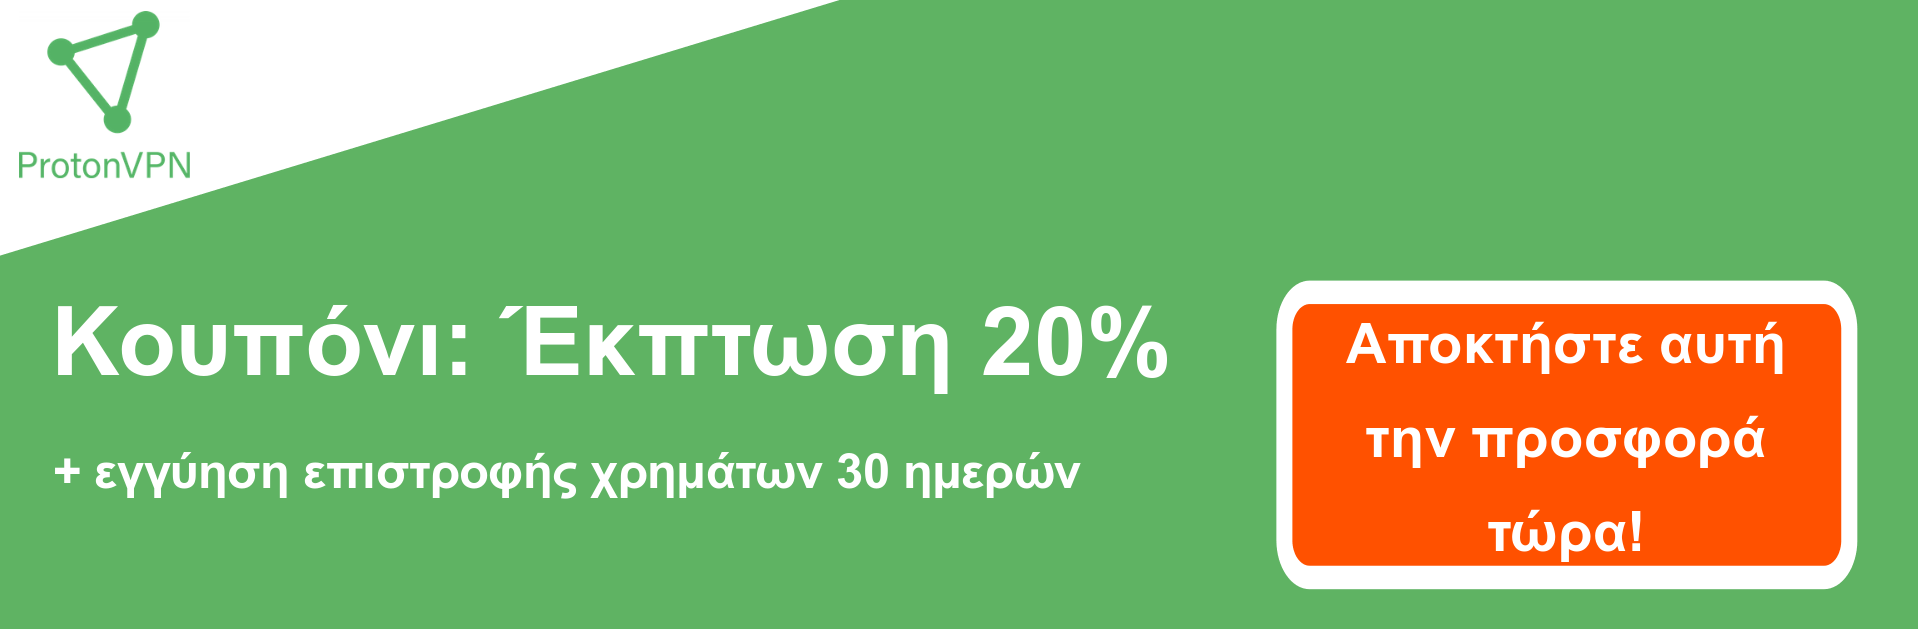 Proton VPN κουπόνι banner - έκπτωση 20%